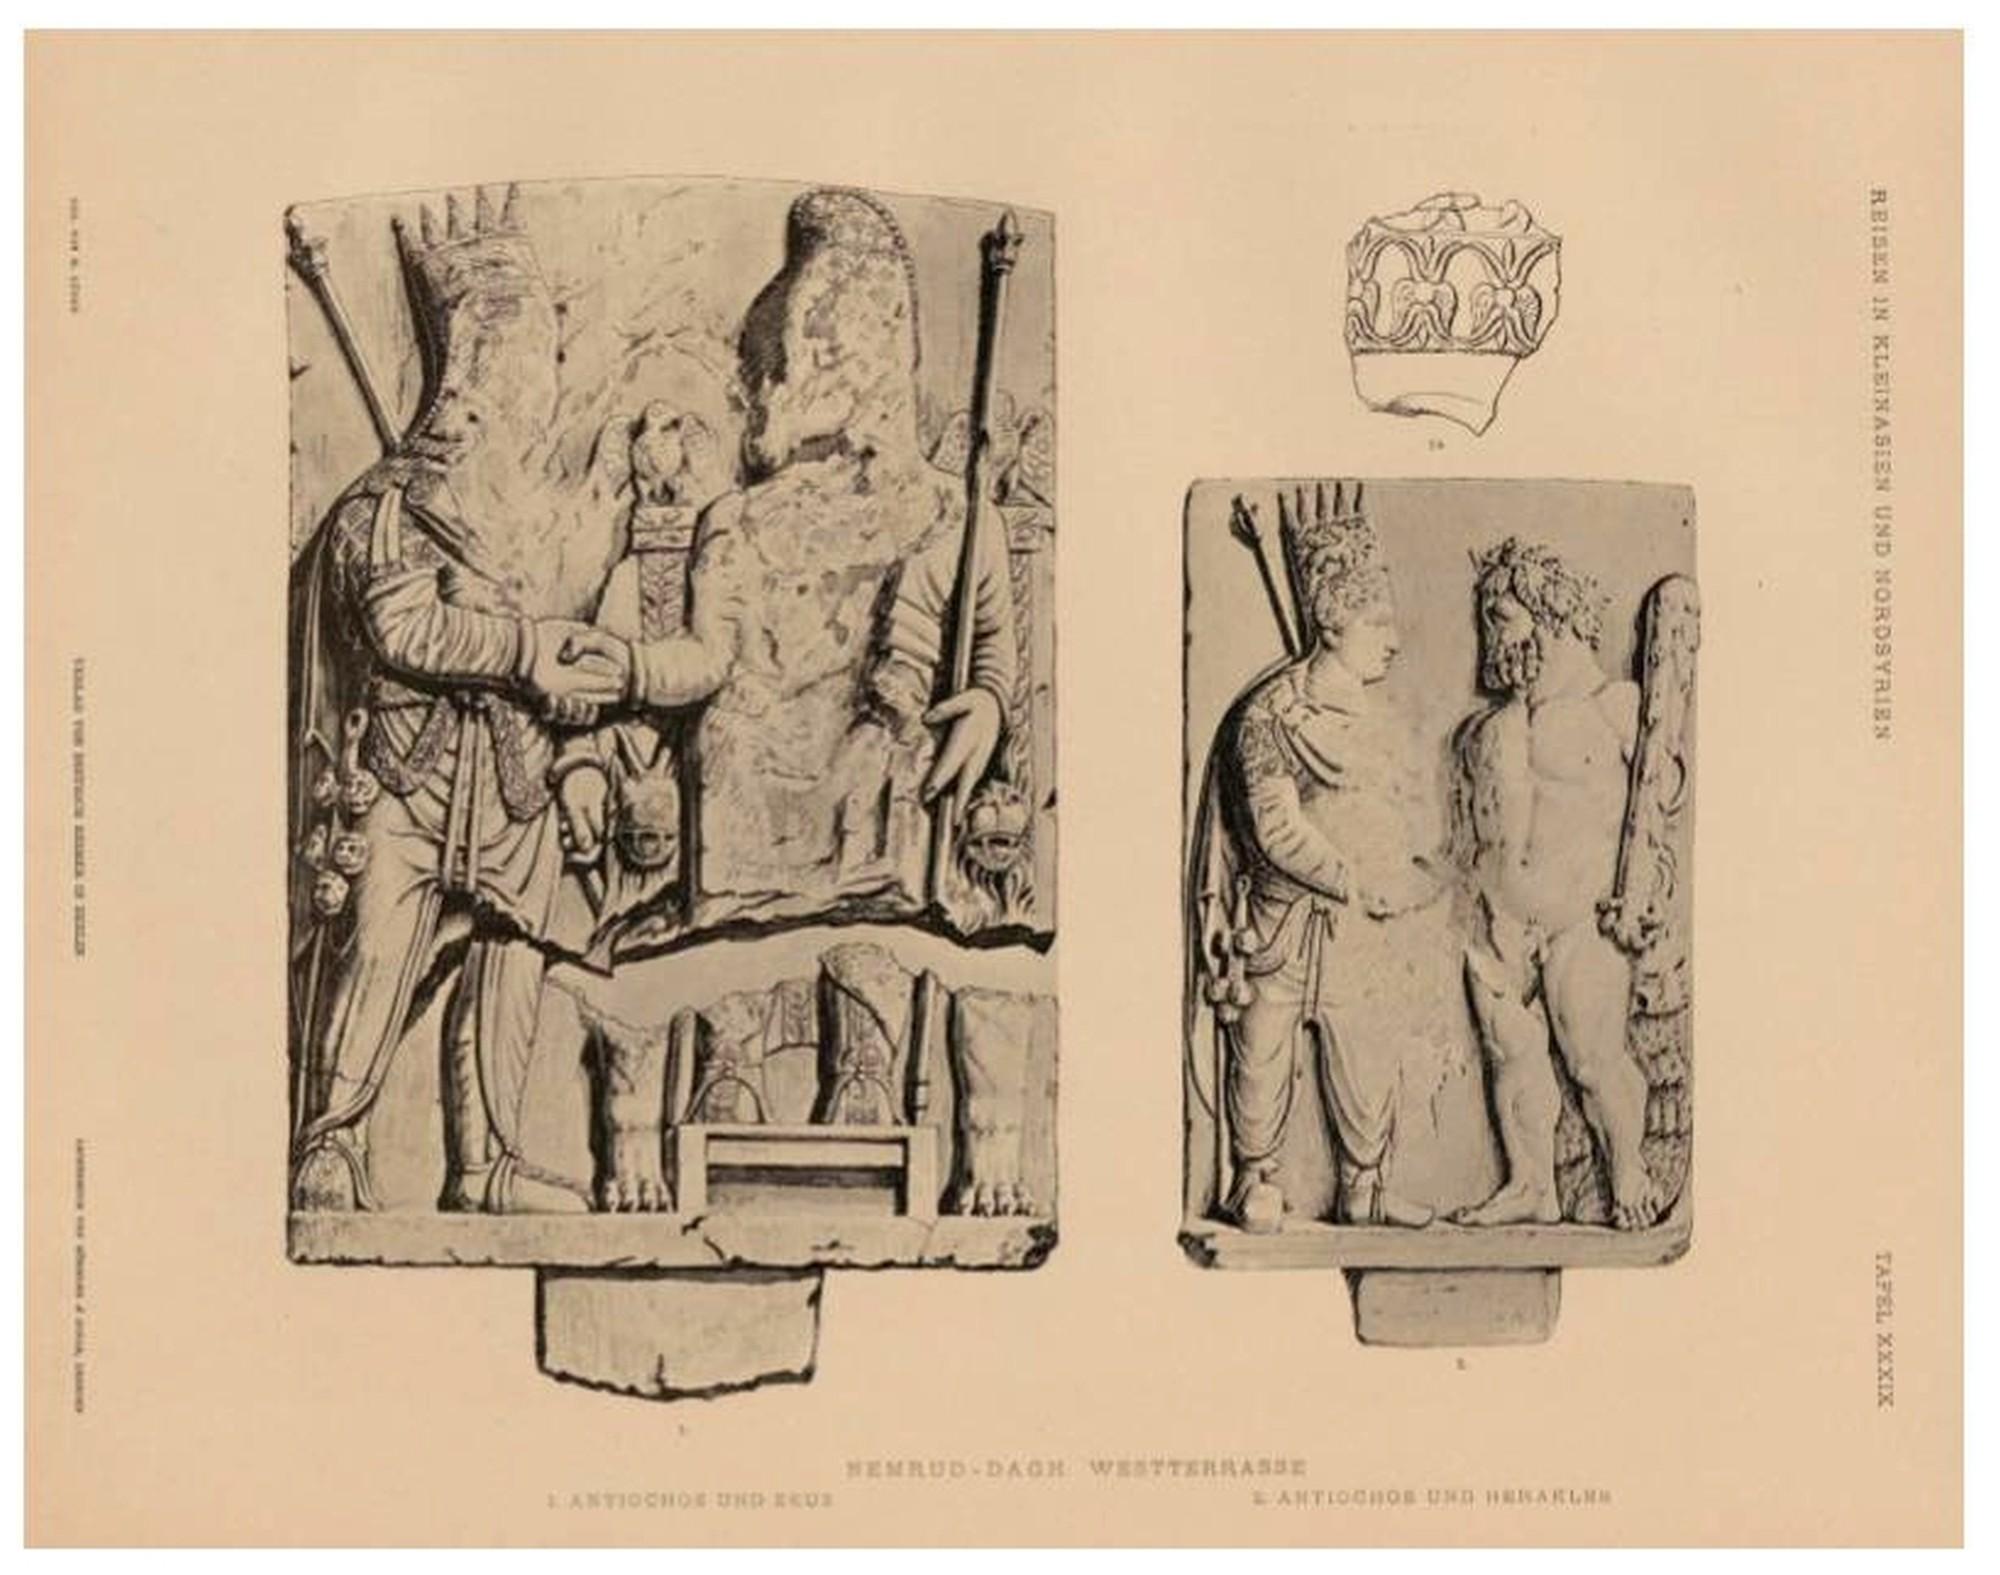 Alívio da dexiose - Antíoco apertando a mão de Zeus e Heracles, West Terrace no monte Nemrut - de Humann, Carl i Puchstein, Otto,